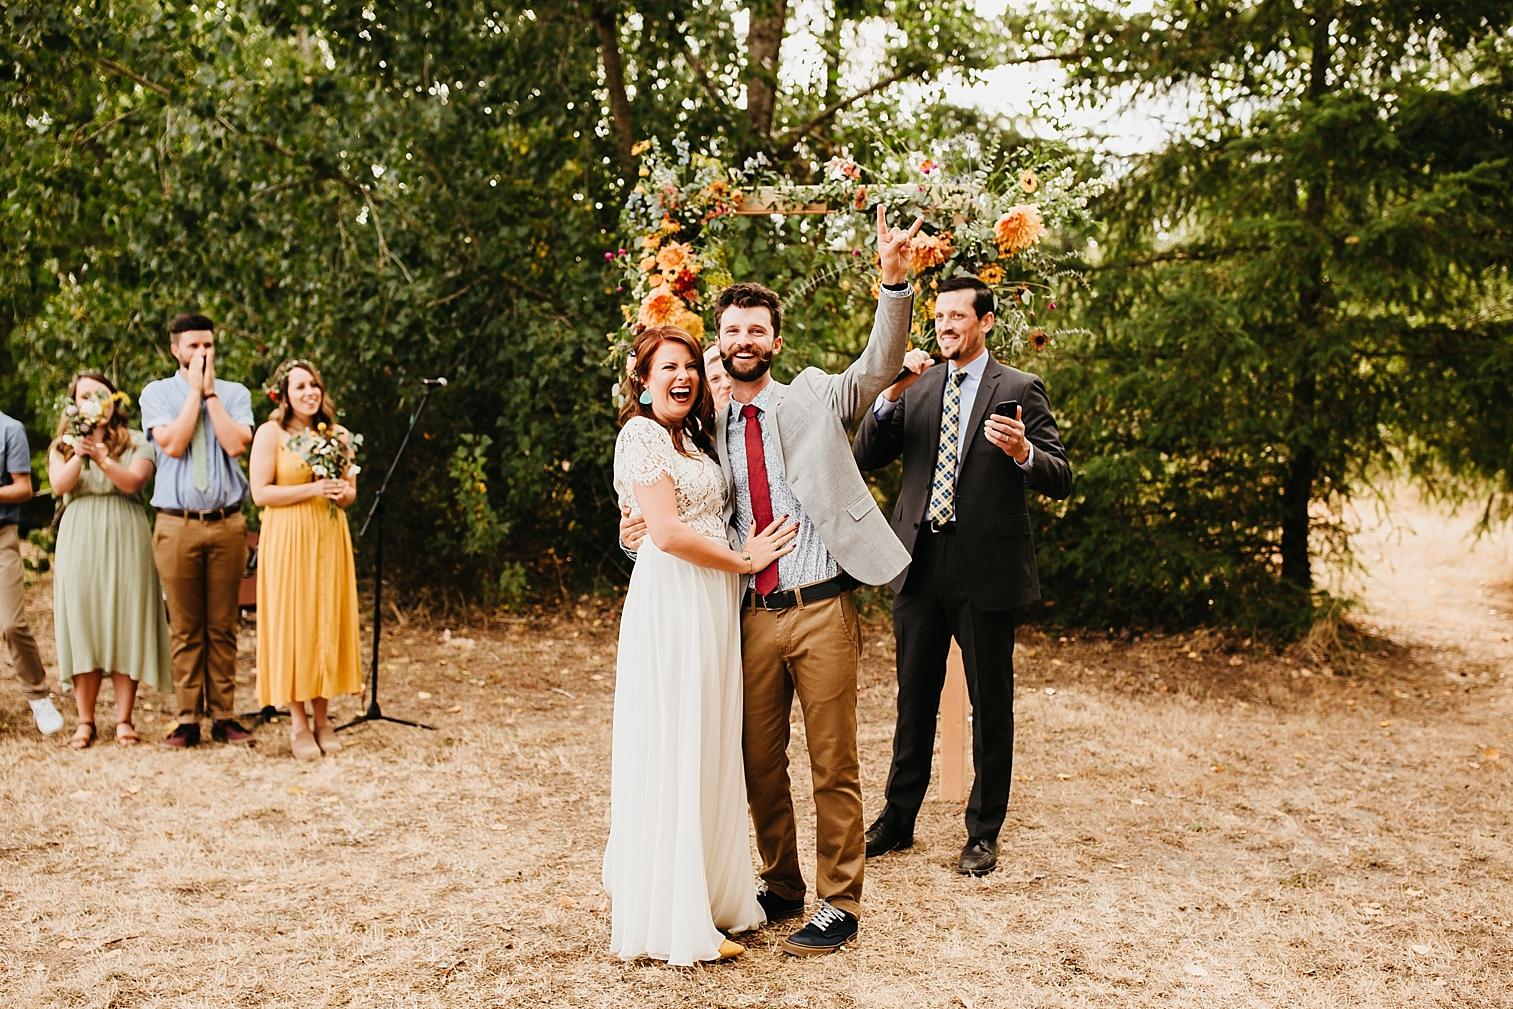 Summer-Camp-Themed-Wedding-103.jpg